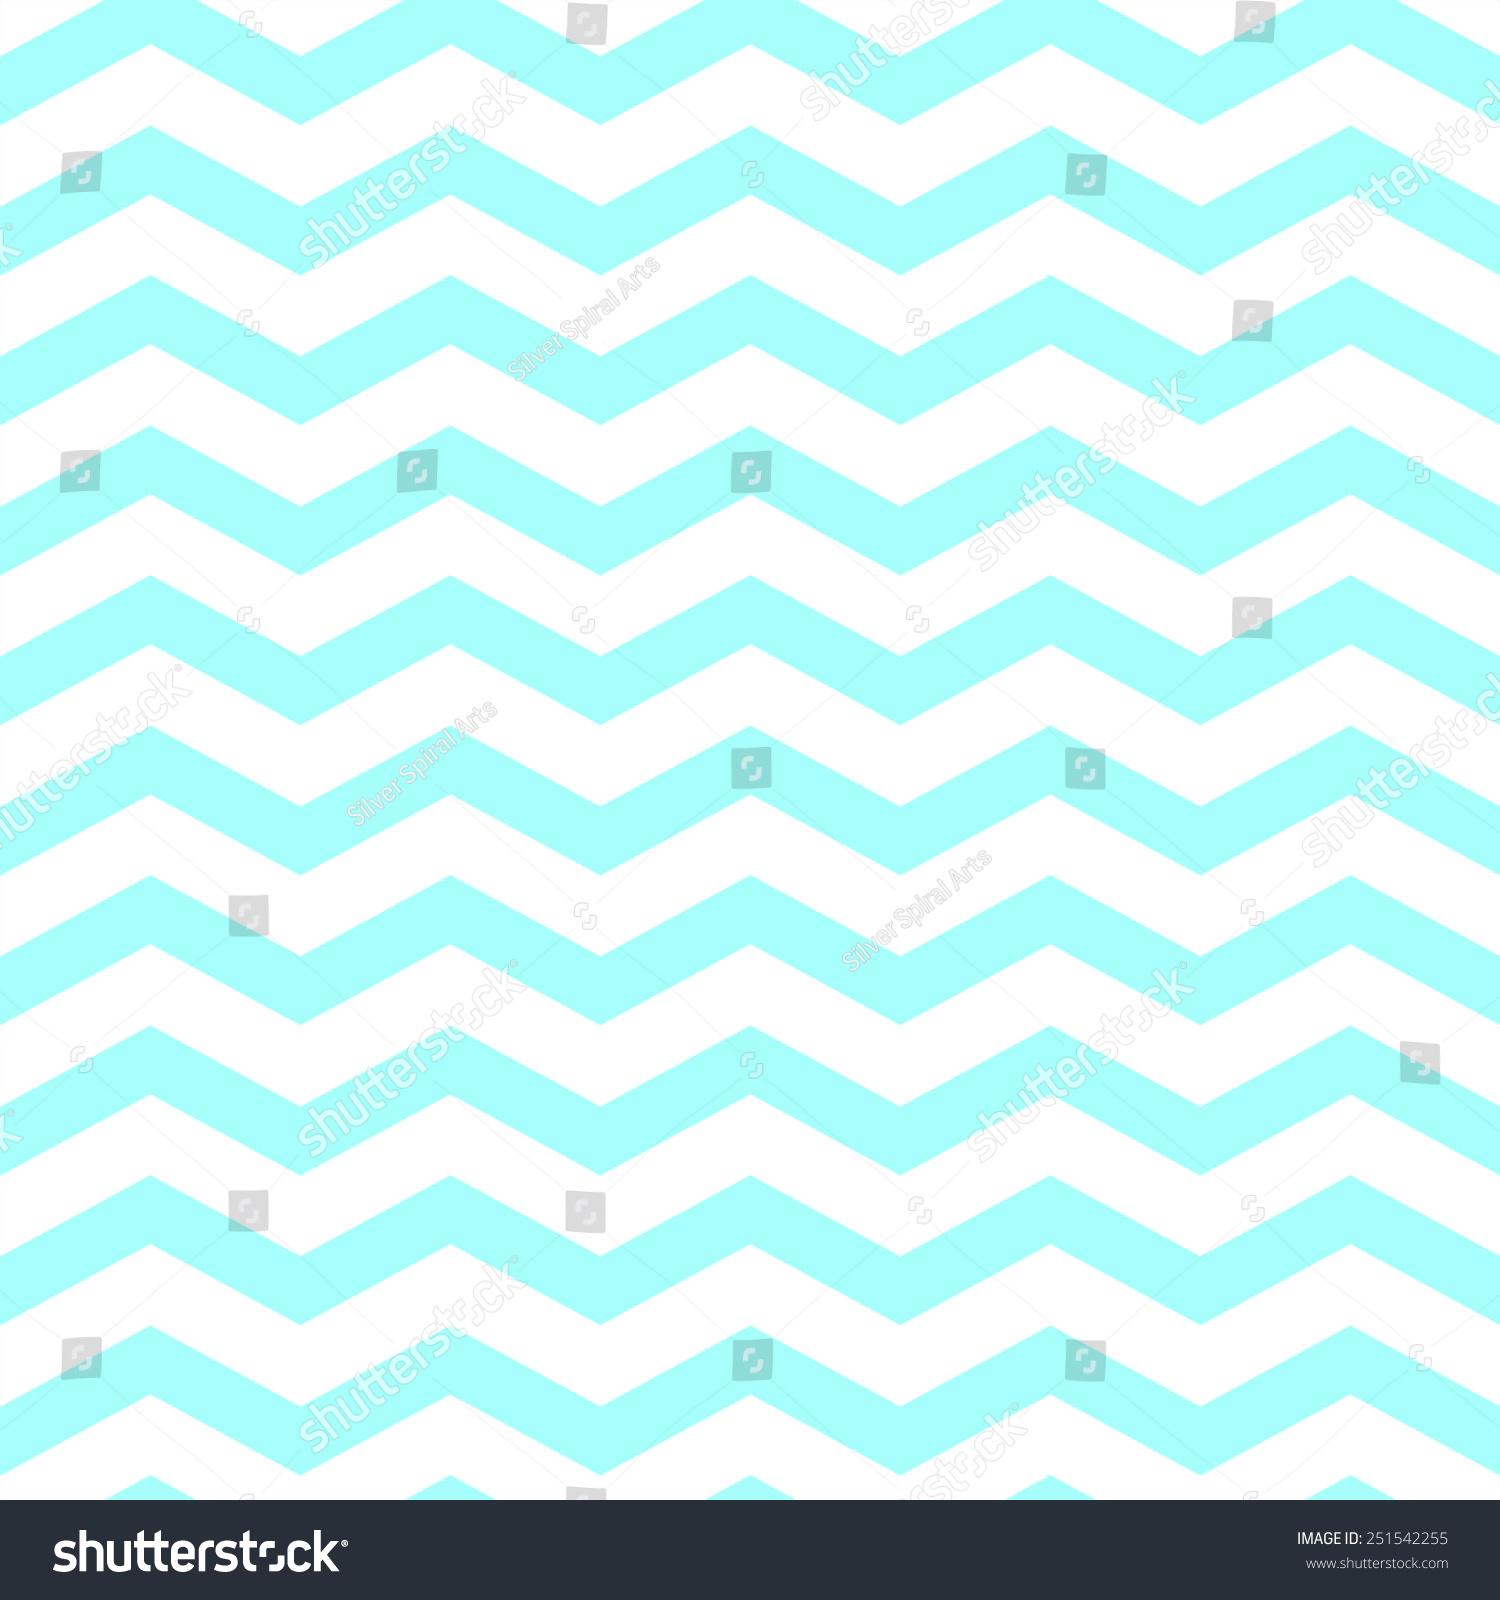 Teal aqua blue white chevron pattern stock illustration